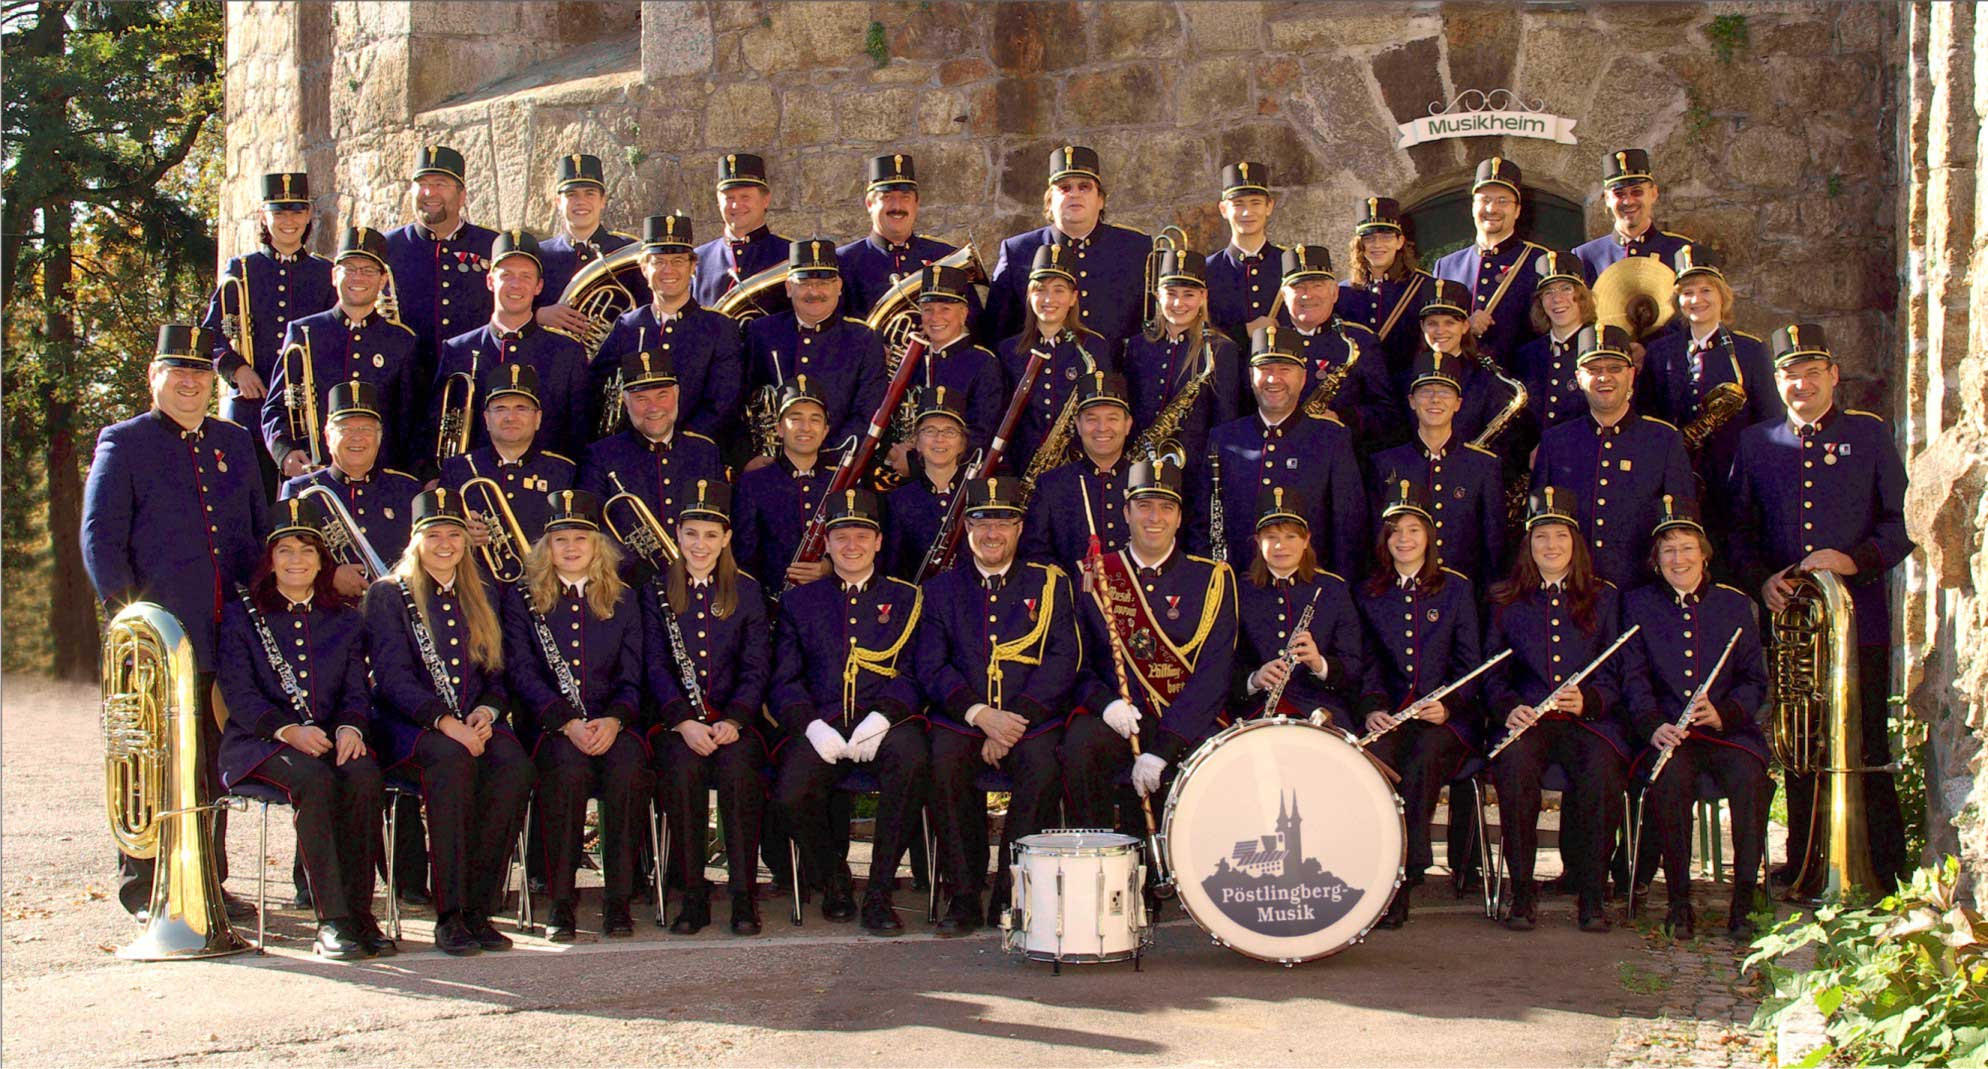 photo: Musikverein Pöstlingberg